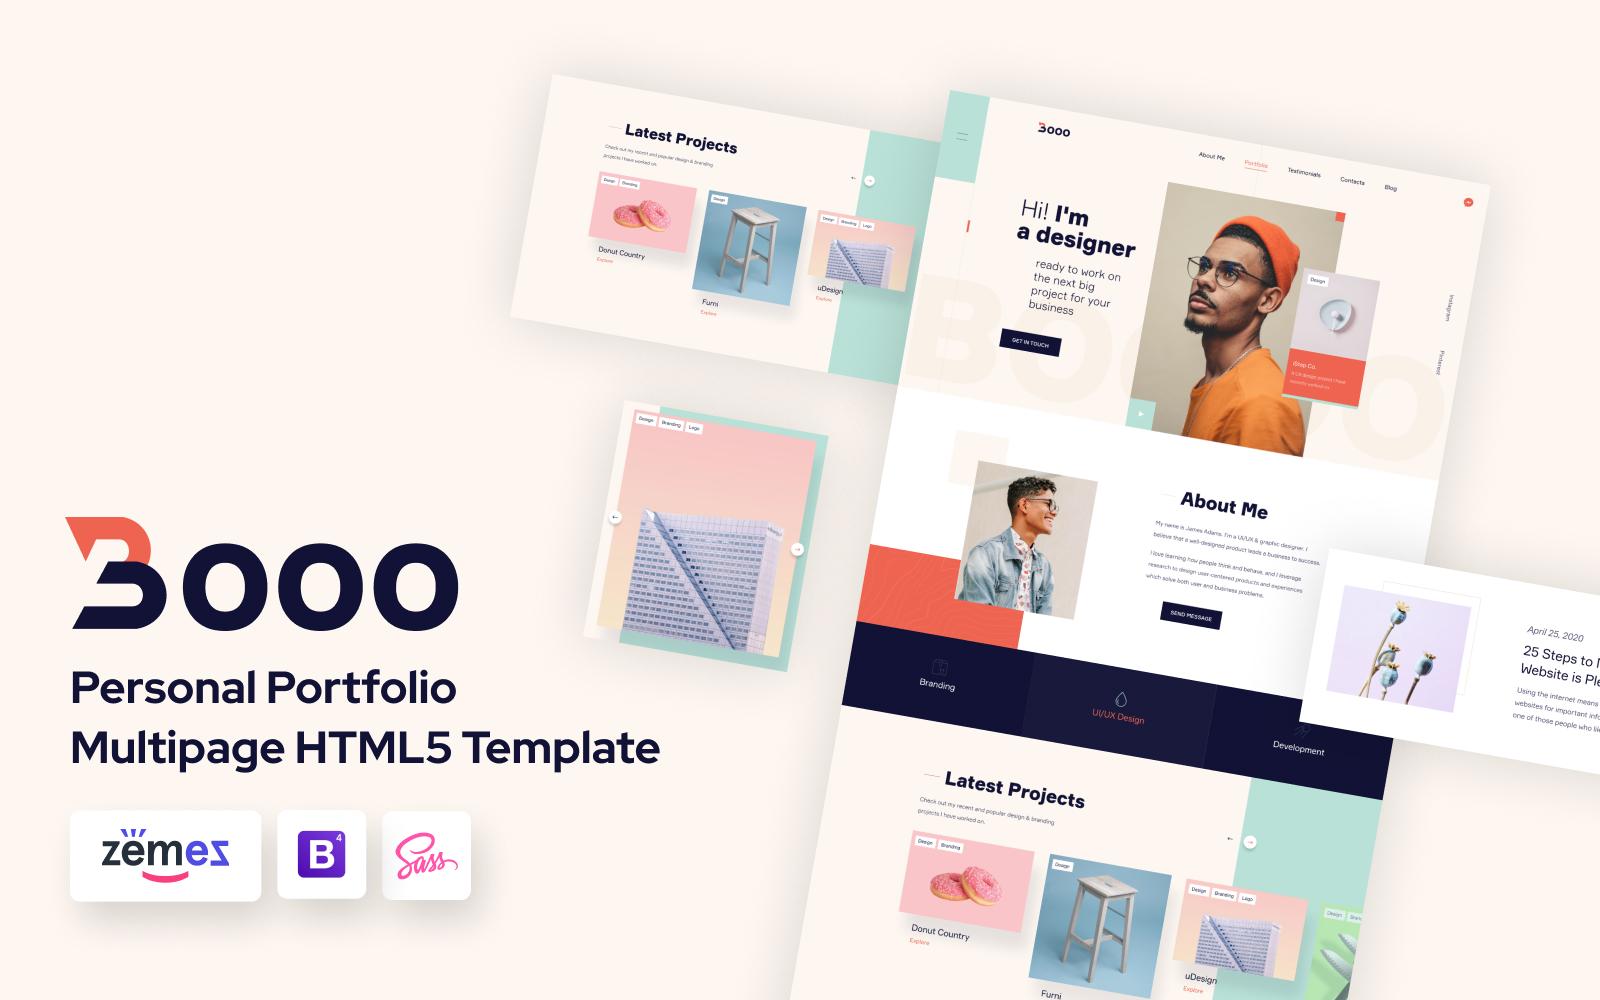 Reszponzív Lintense Personal Portfolio - Web Designer HTML Nyítóoldal sablon 110019